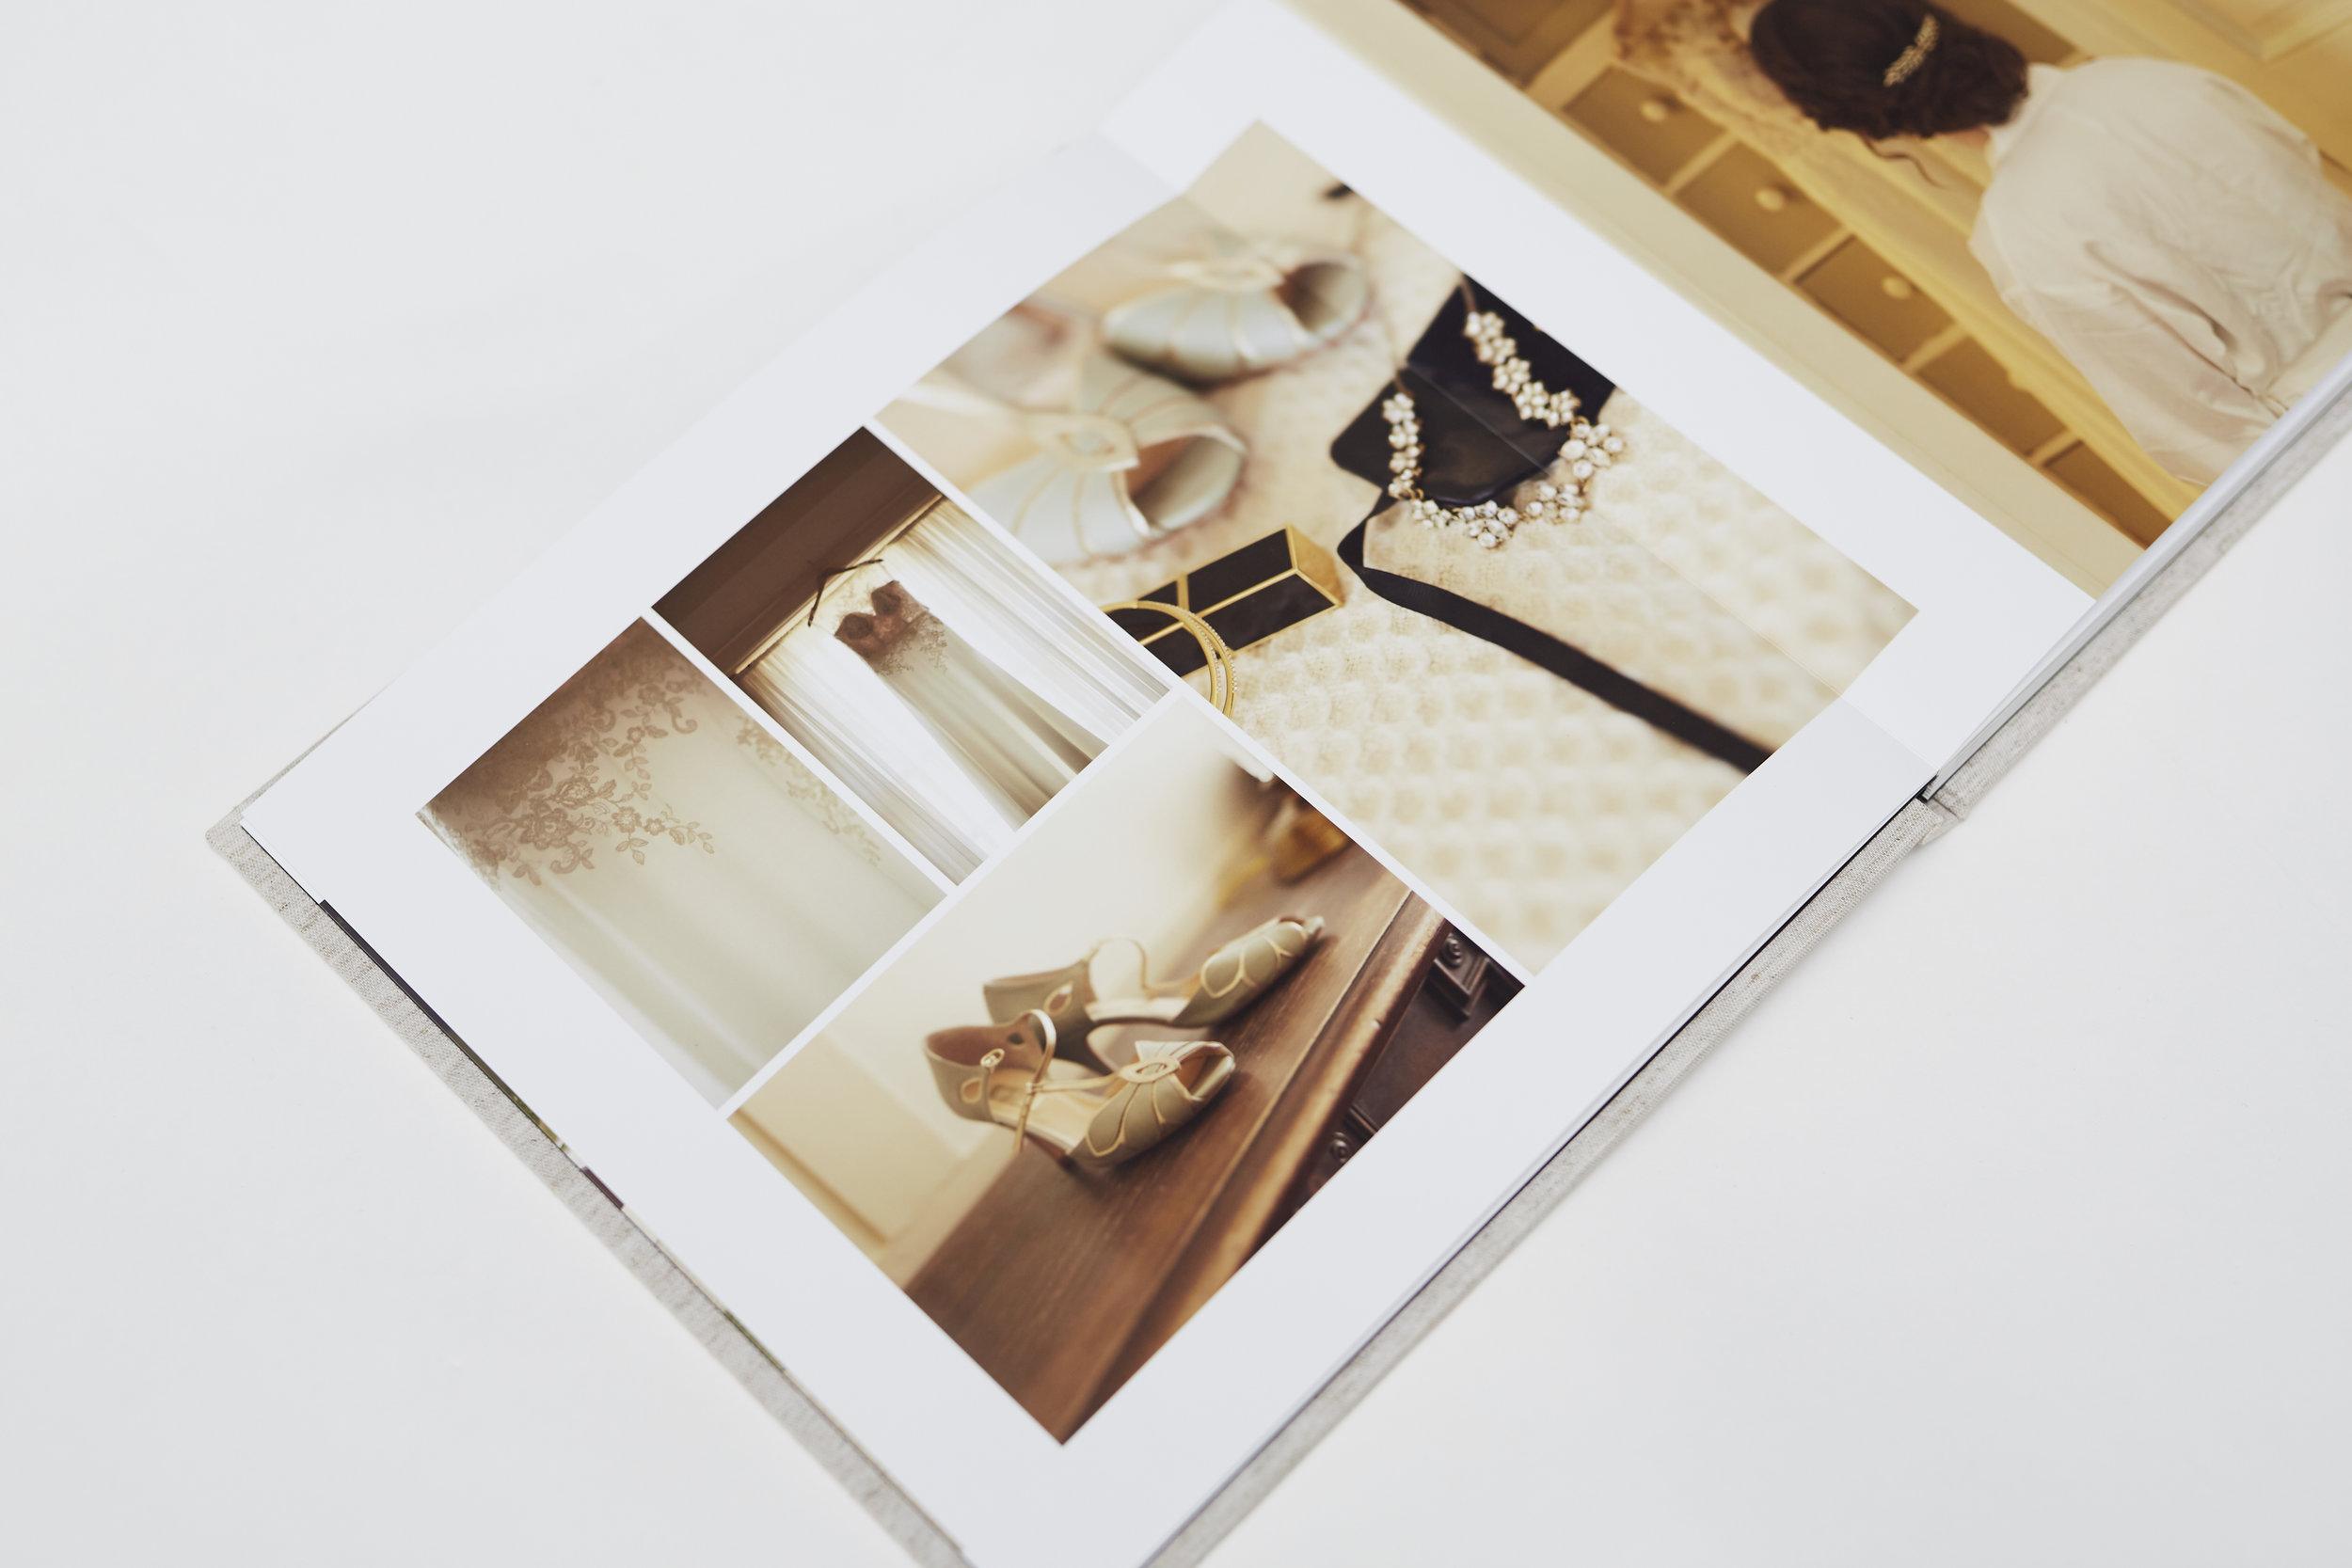 album - benromangphoto - 6I5A6305 1.jpg